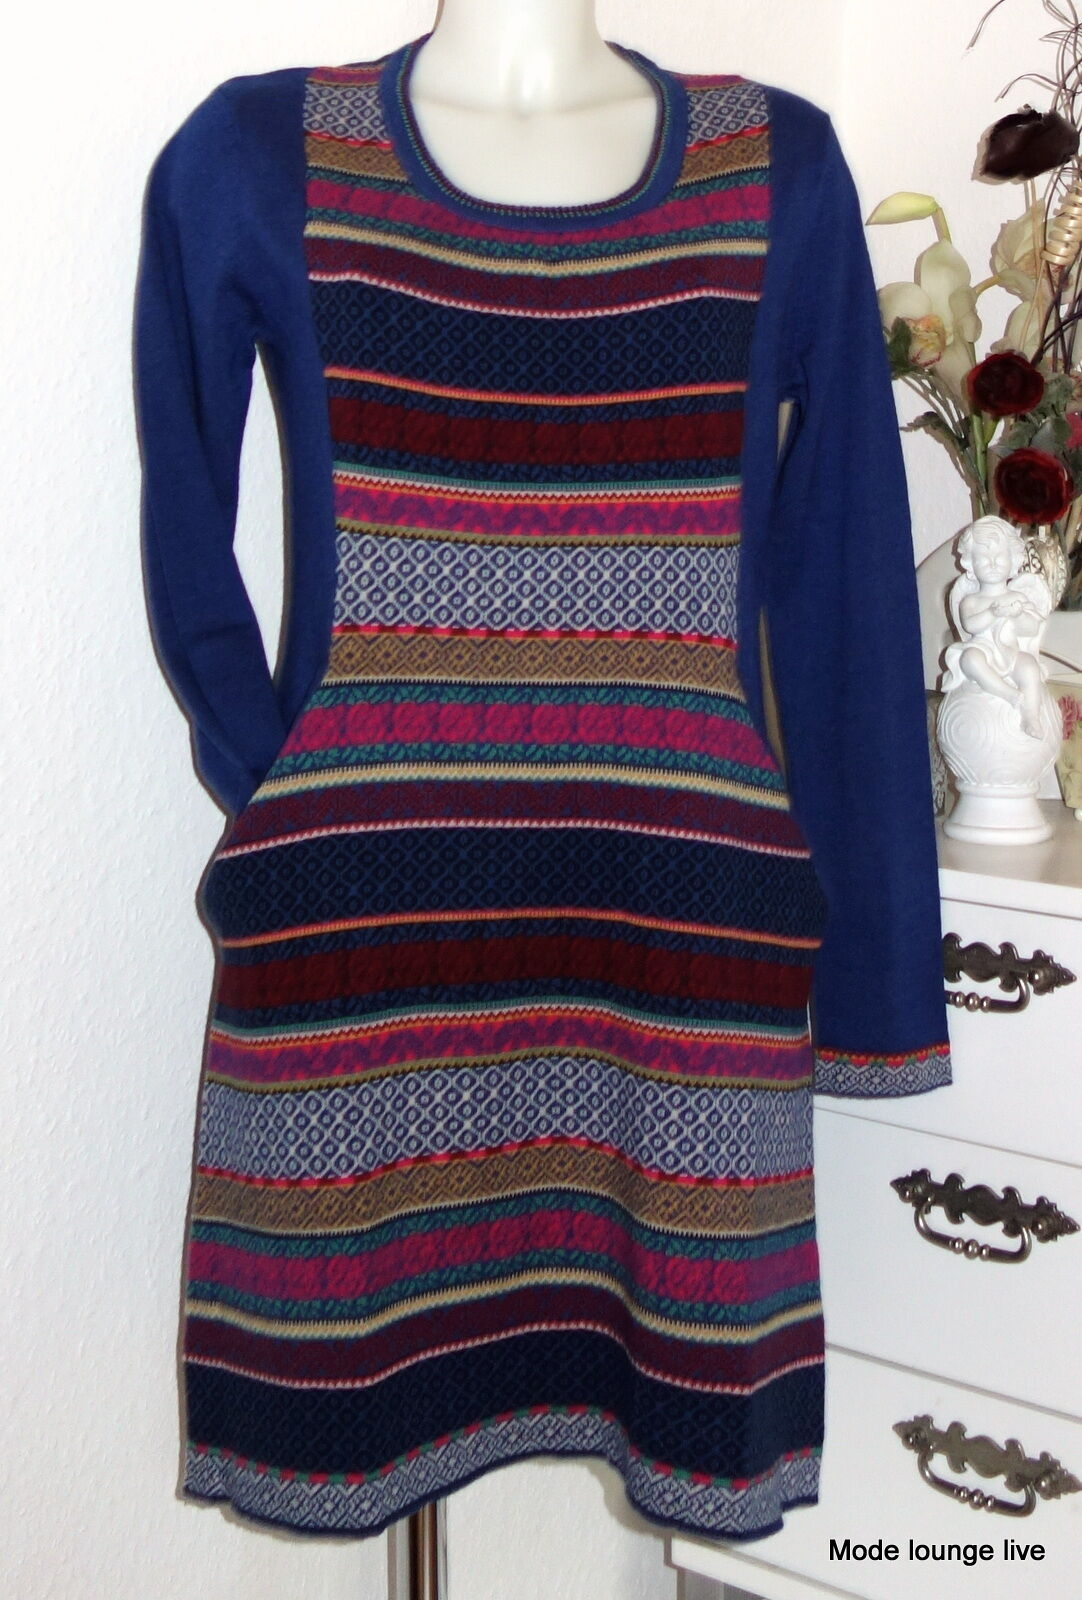 Thought Braintree Kleid Indigo Biobaumwolle organic cotton Penda Dress wwd 2412